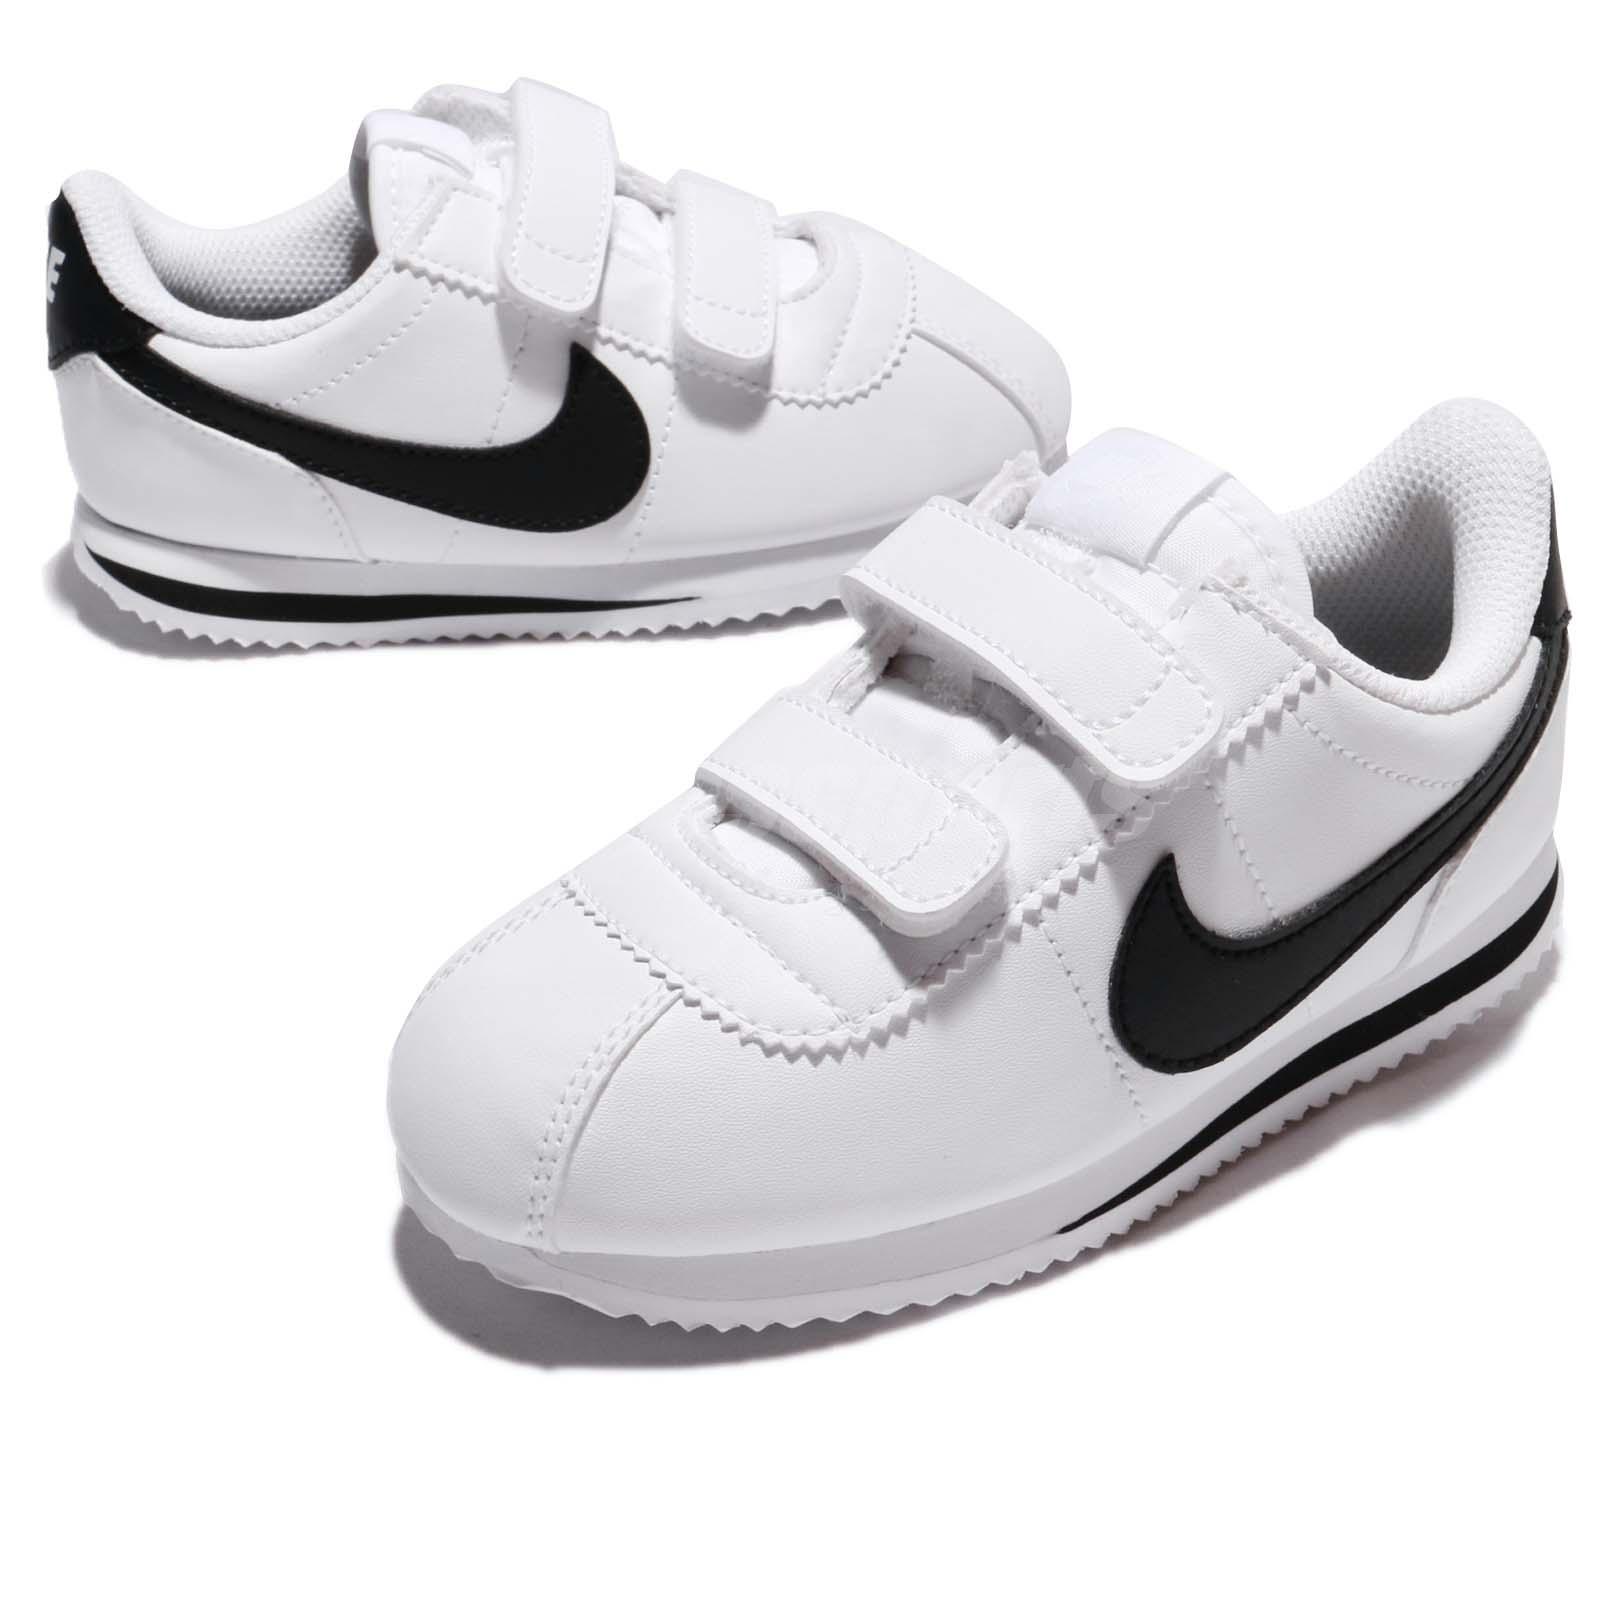 9452be2f02 Nike Cortez Basic SL TDV White Black Toddler Infant Baby Shoe ...